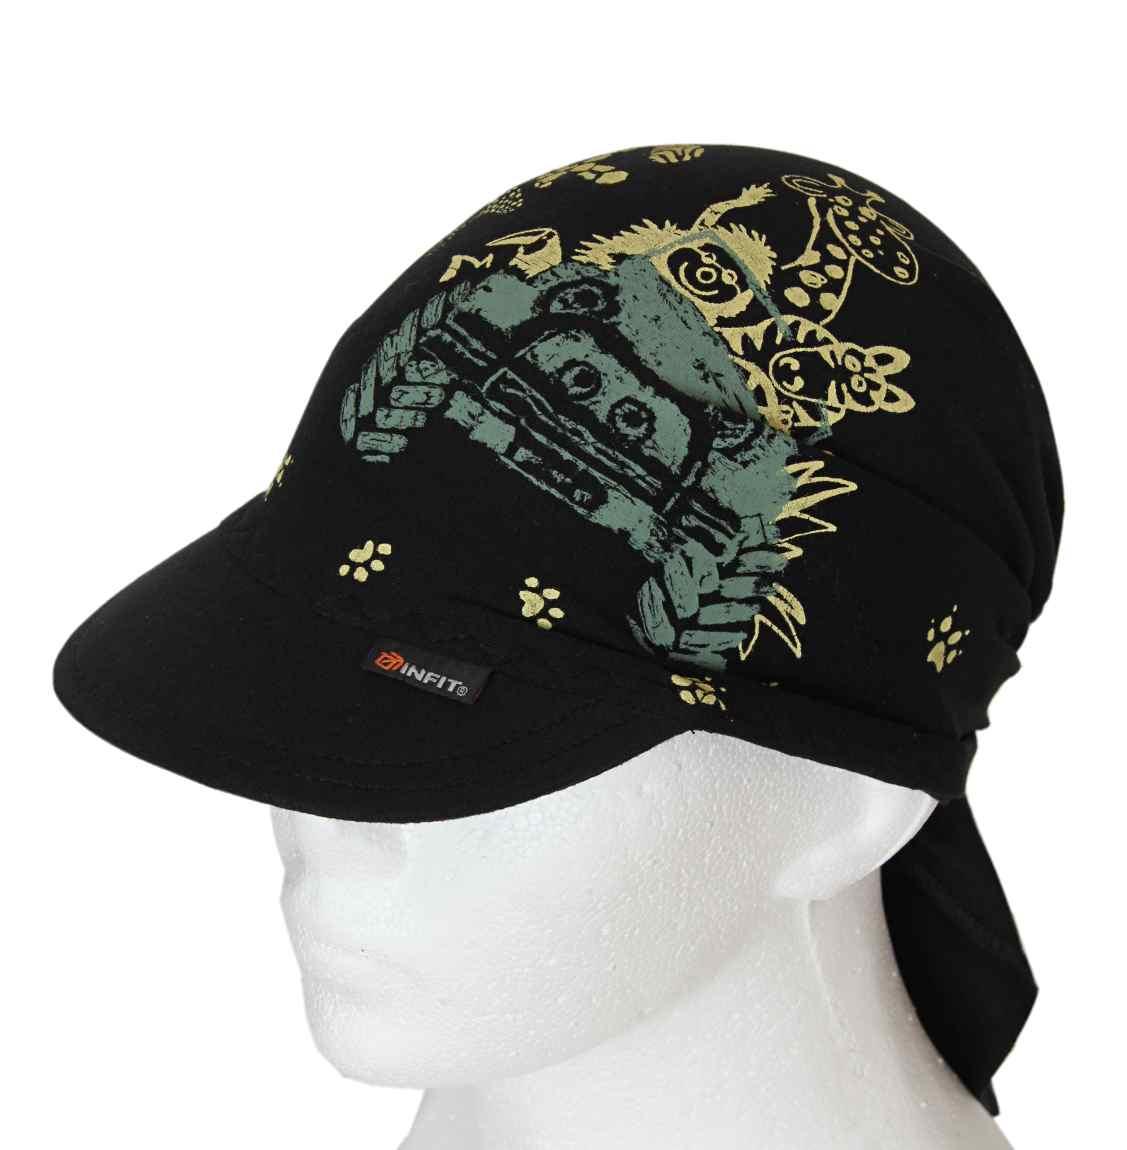 d4ac7cabc0f Dětský šátek s kšiltem černý vzor Safari